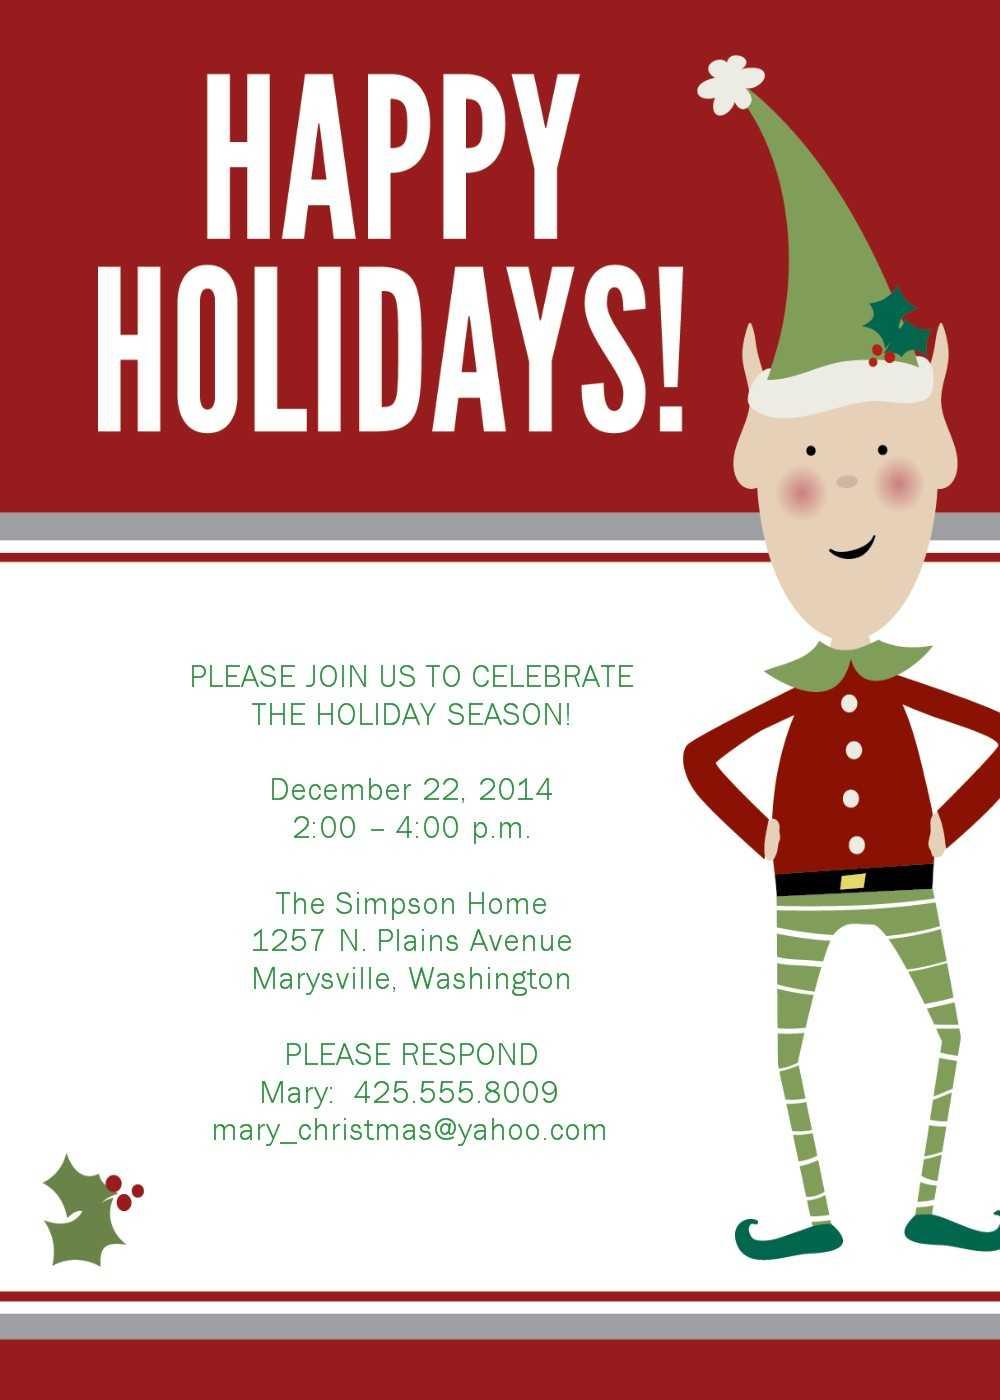 Xmas Party Invite Template Free ] – Christmas Invitation For Free Christmas Invitation Templates For Word